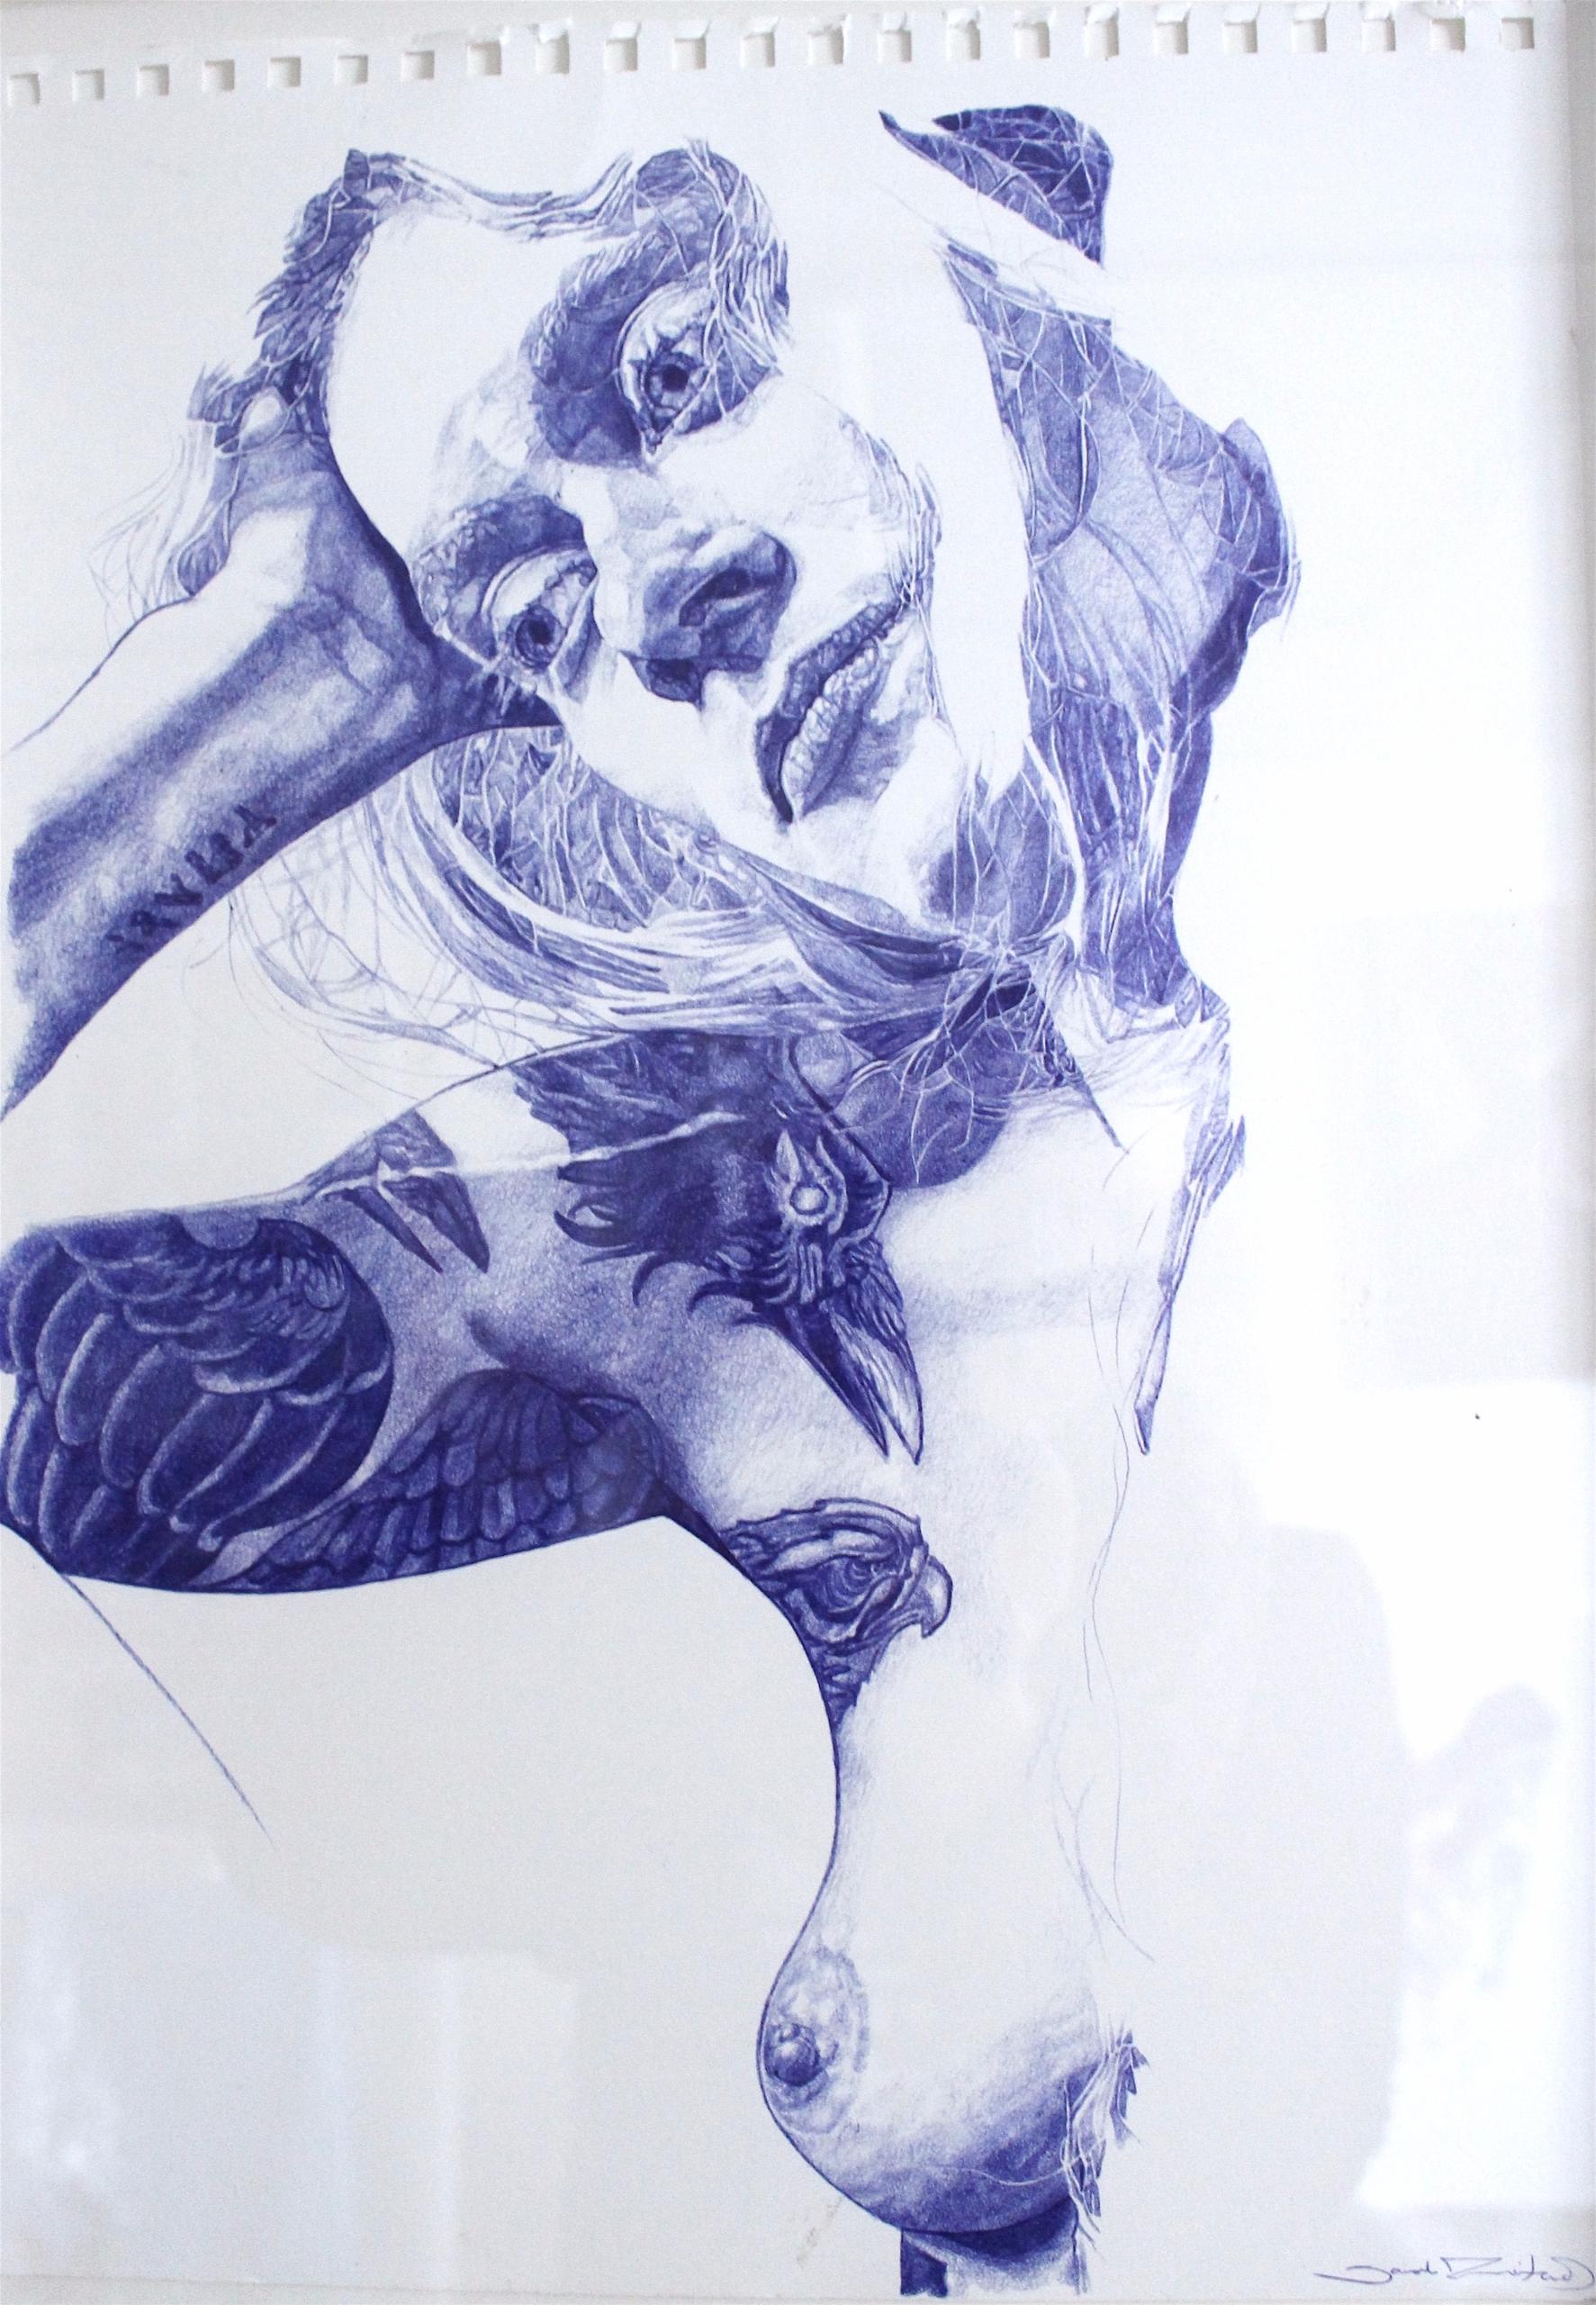 'Untitled 5' bic biro paper, 30 - sarahmuirhead   ello